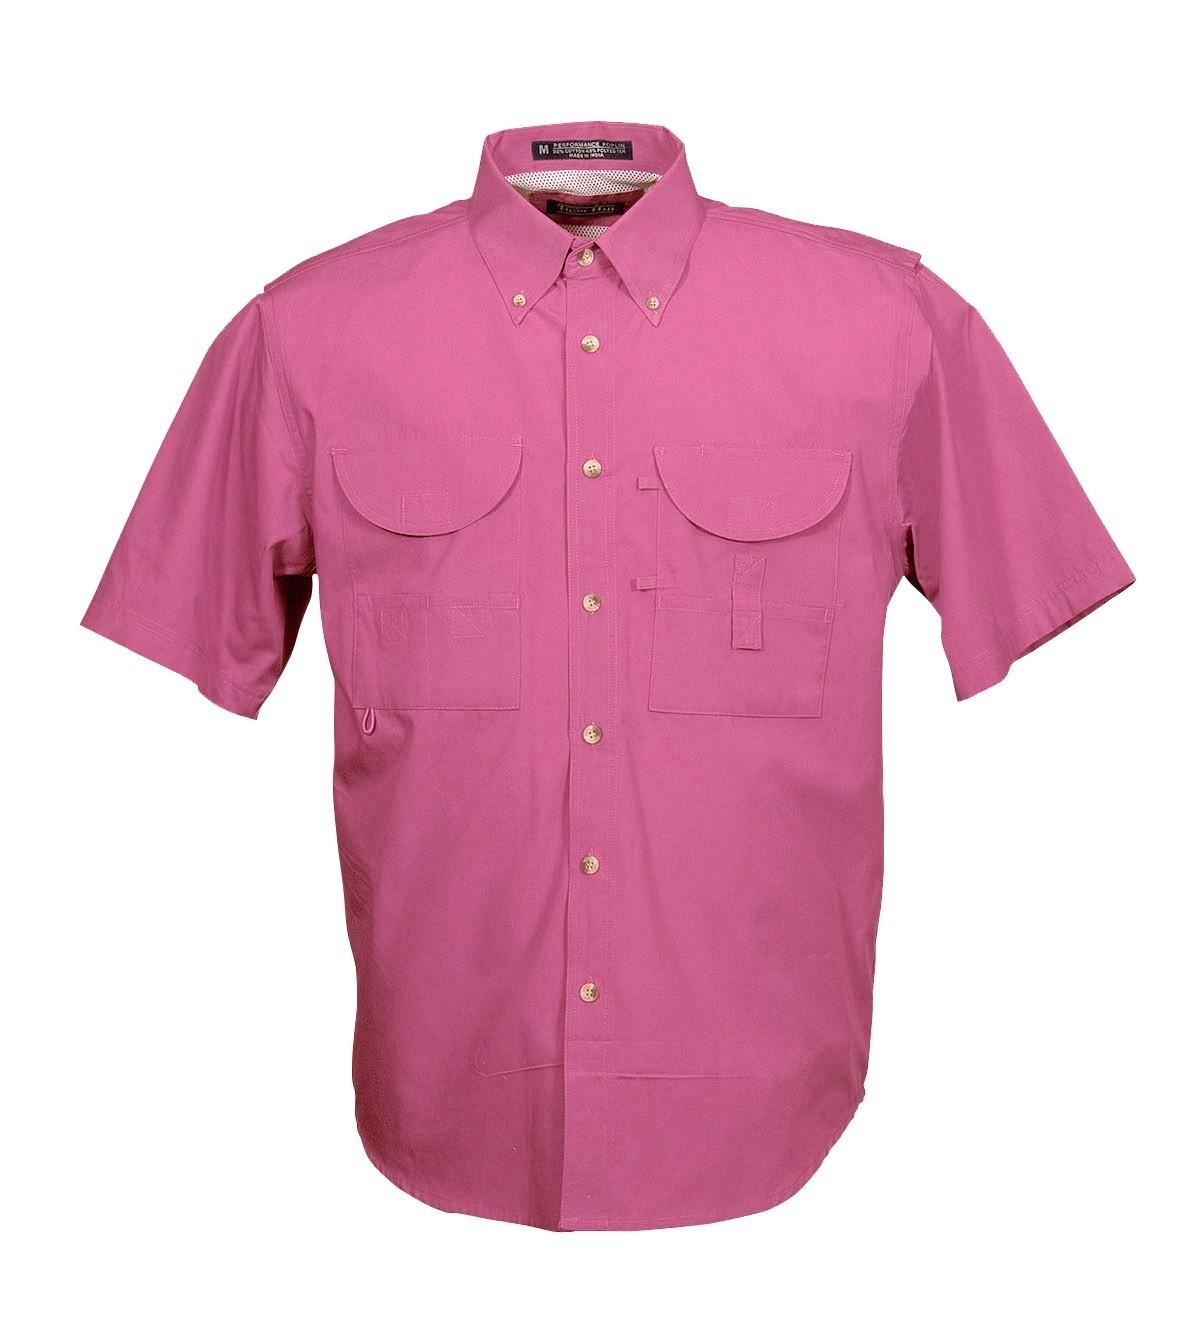 Tiger Hill Men's Fishing Shirt Short Sleeves Pink